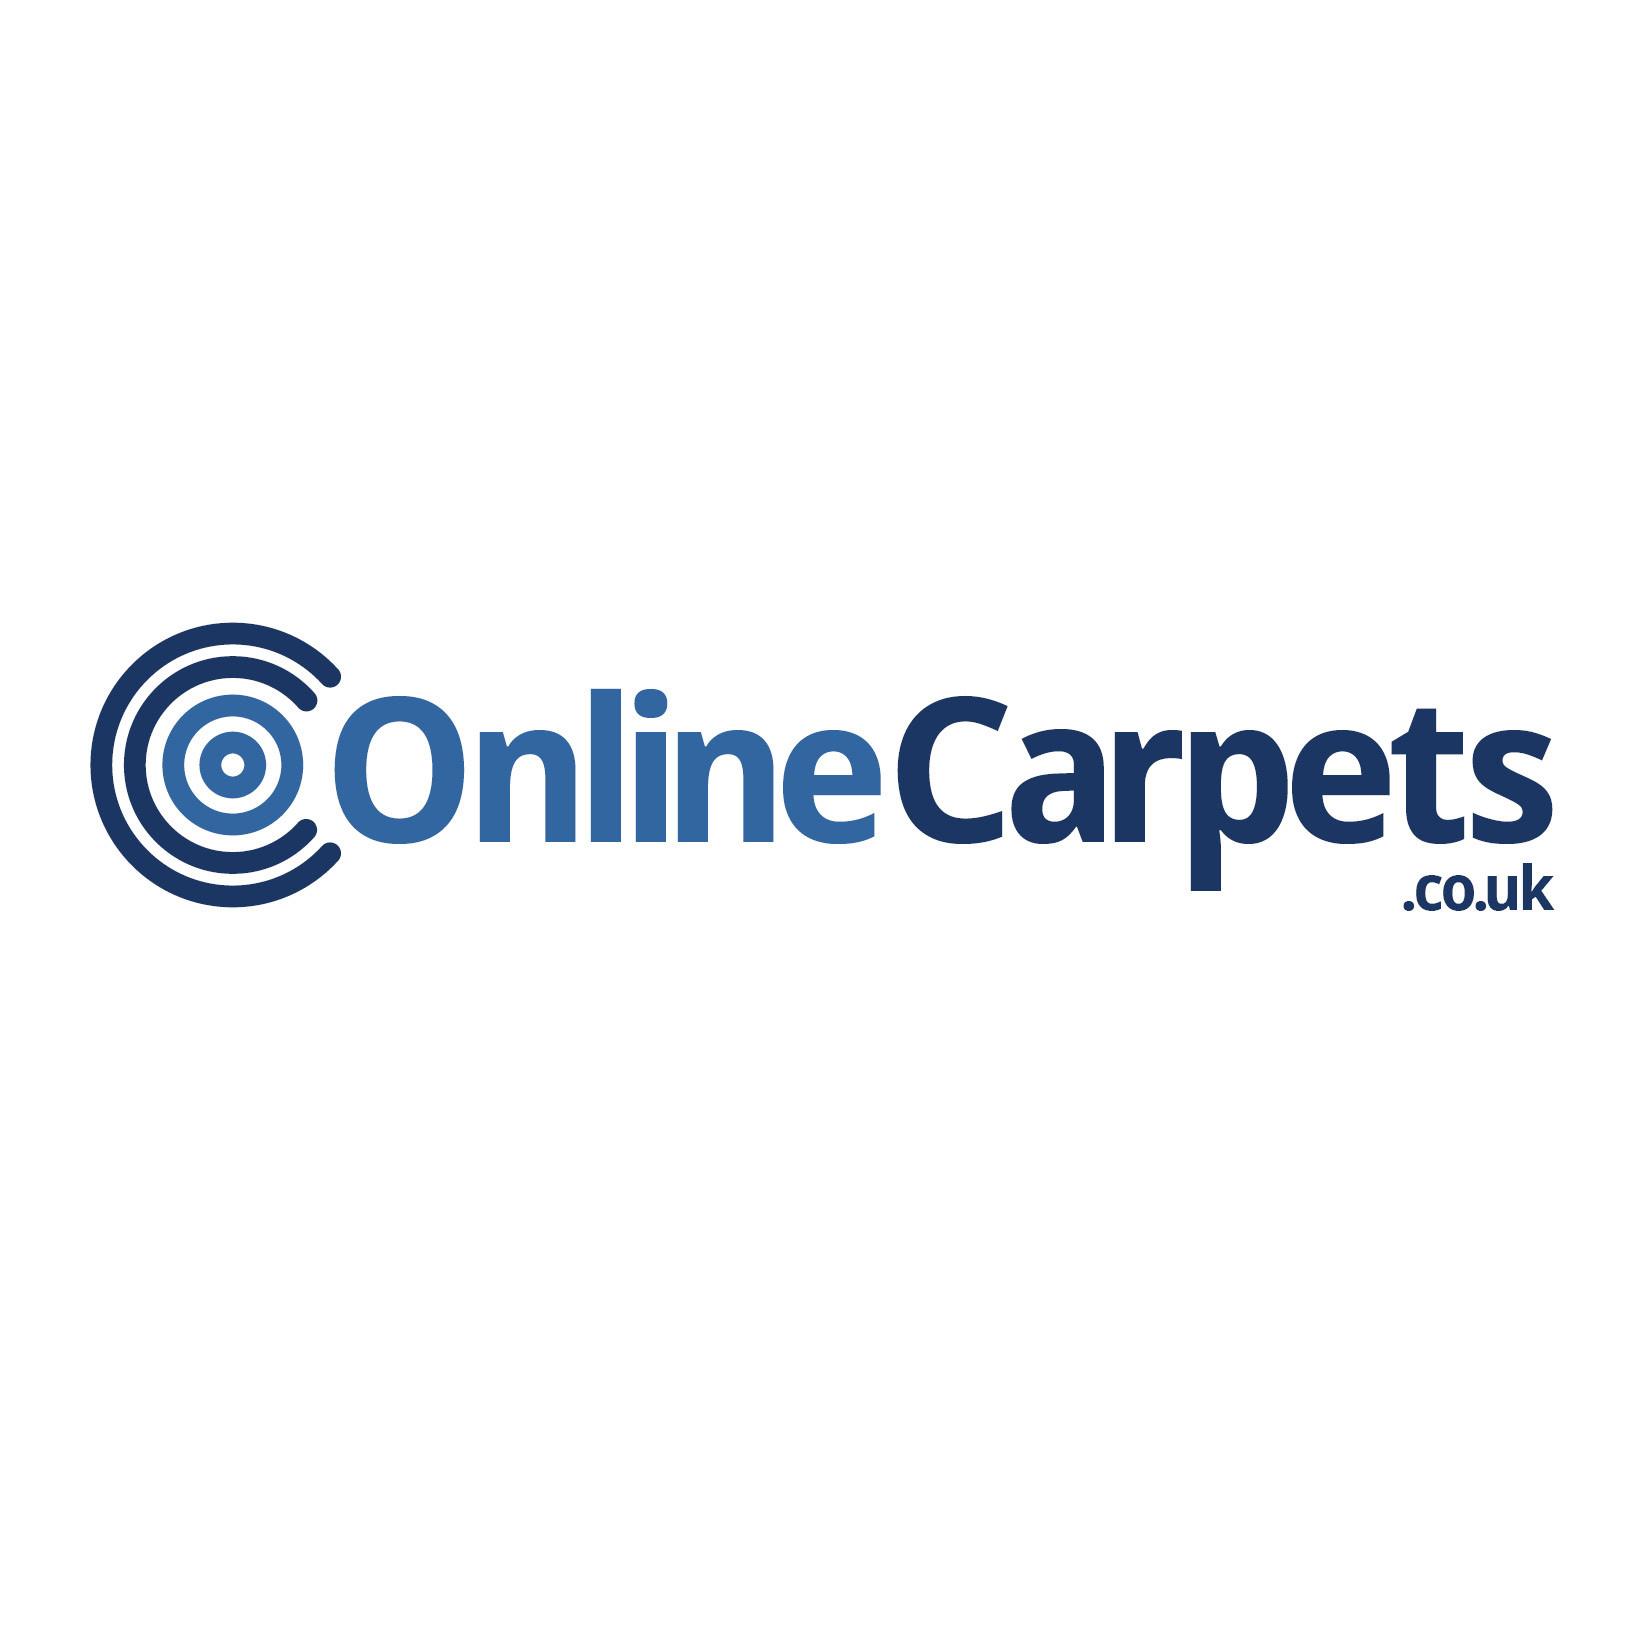 Online Carpets Uk >> Artstation Online Carpets Richard Bradshaw